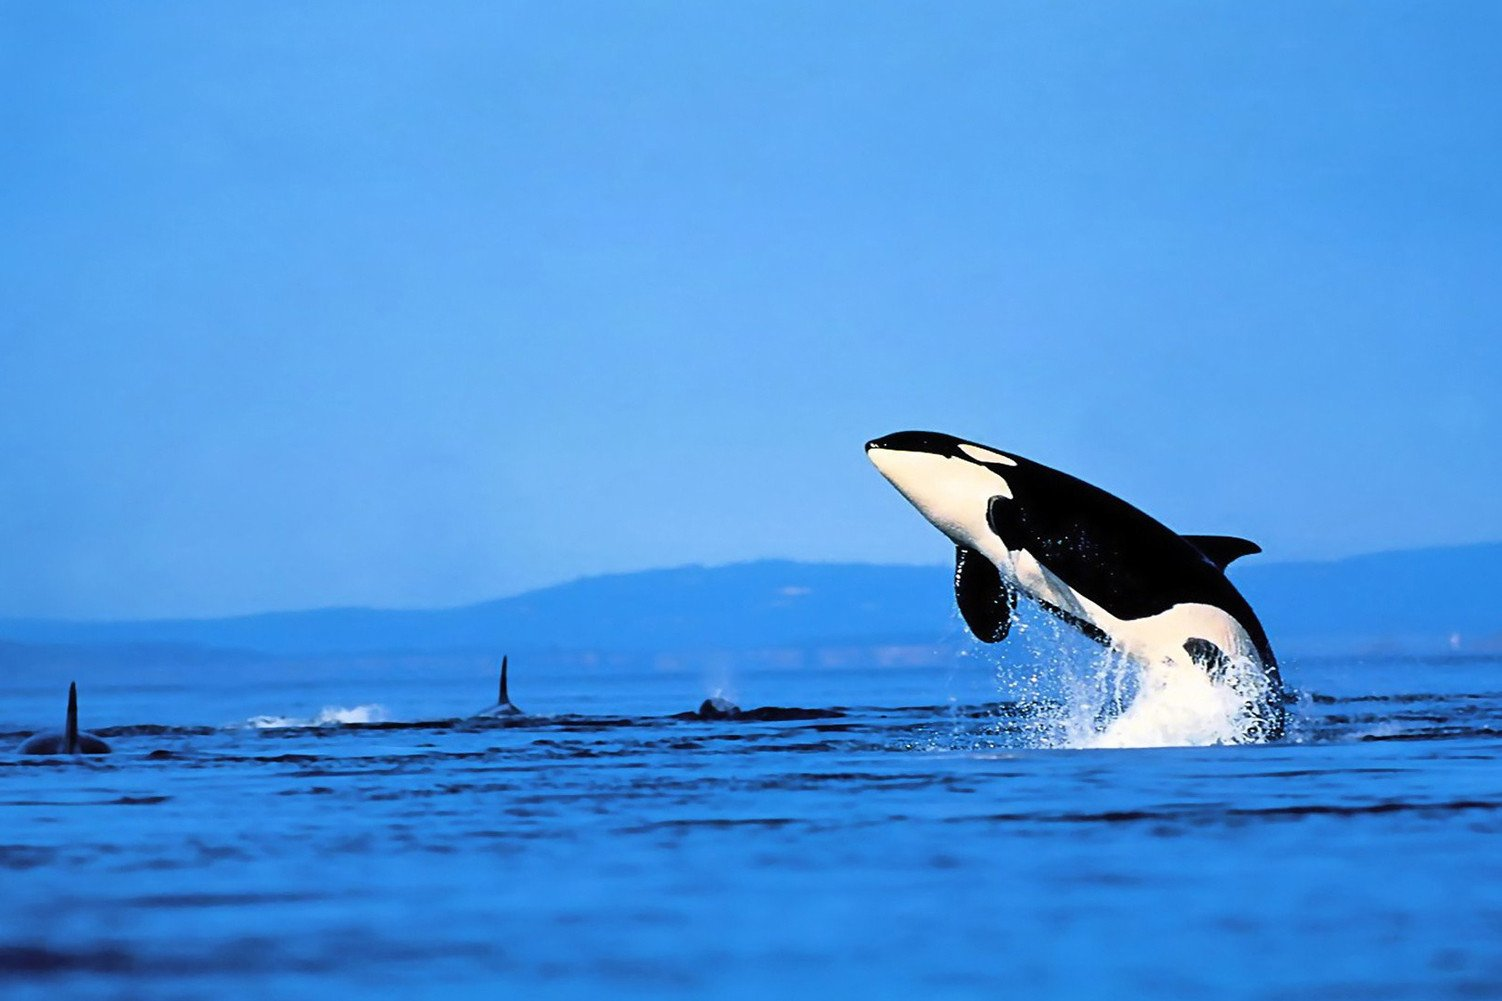 CHOIS Custom Films CF3311 Animal Dolphins Sea Glass Window Decor DIY Stickers 3' W by 2' H